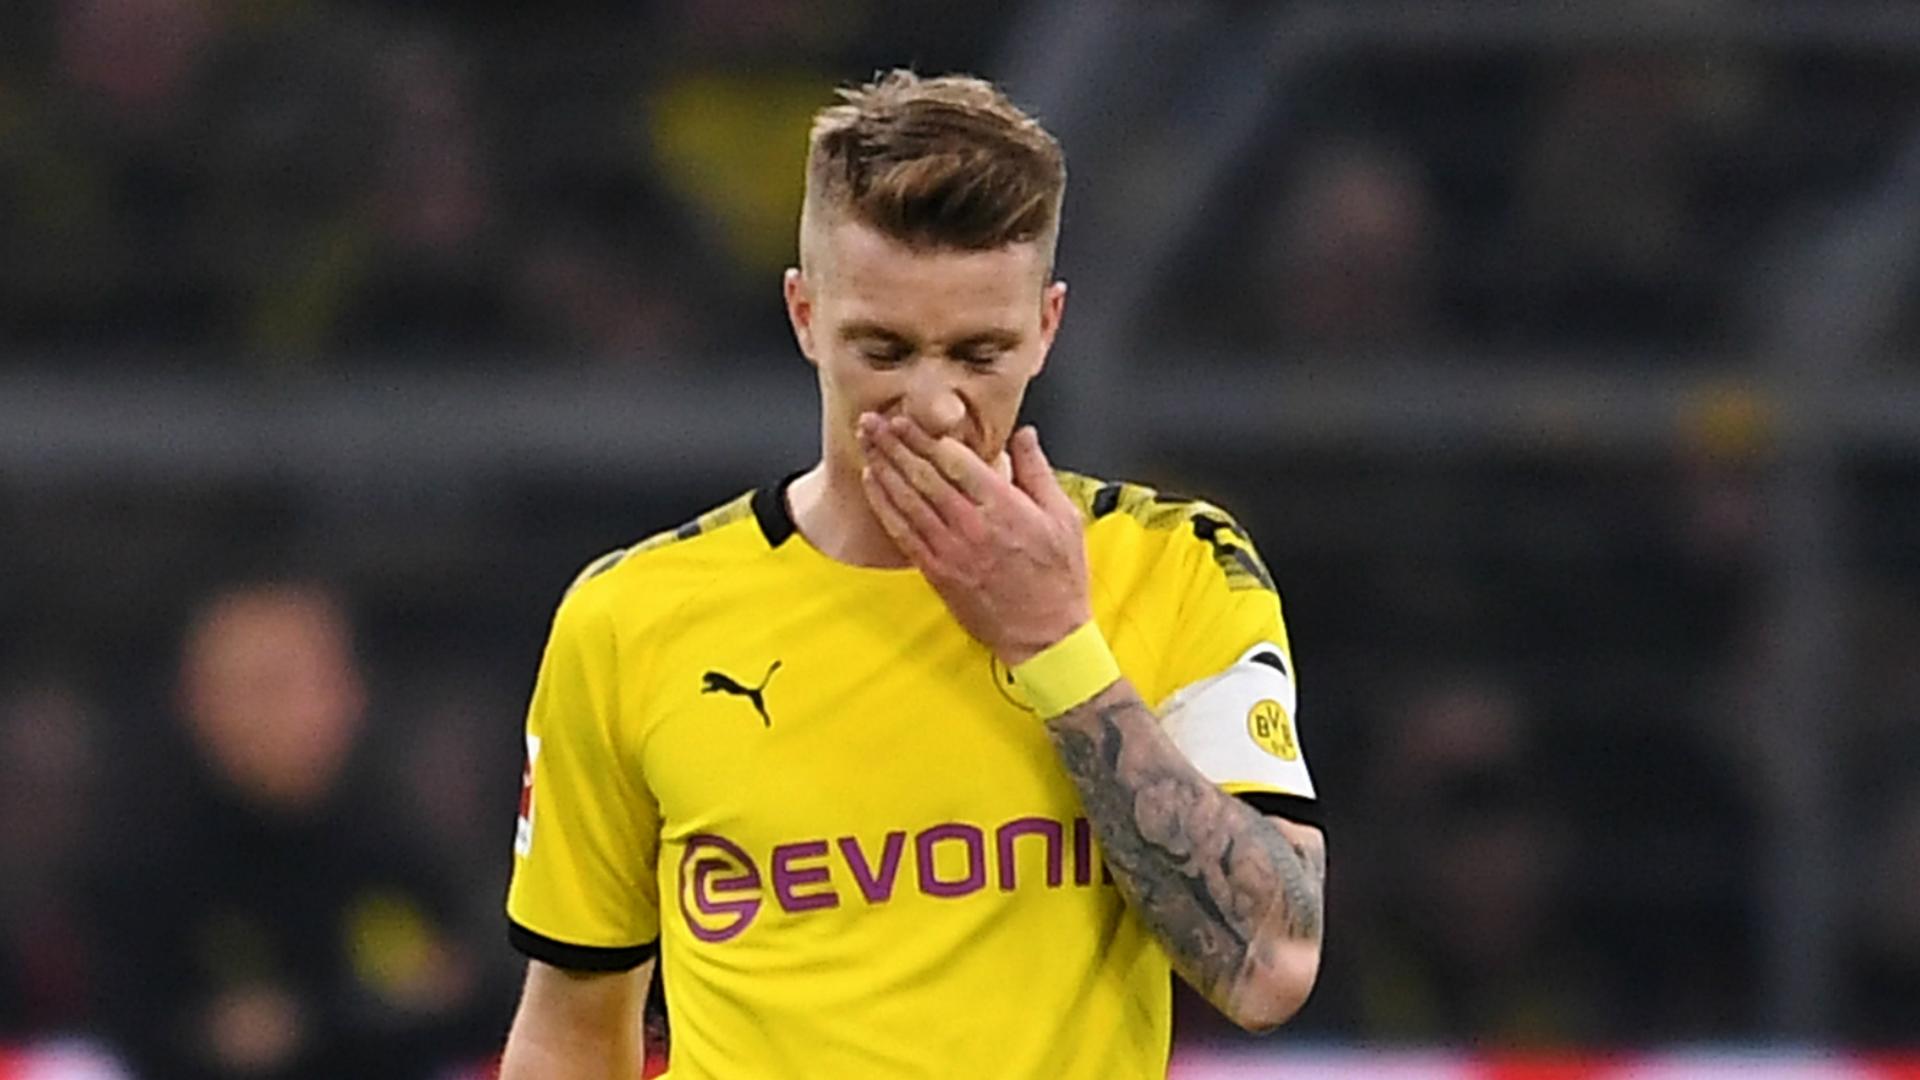 Reus 'ashamed' of Borussia Dortmund despite dramatic Paderborn comeback